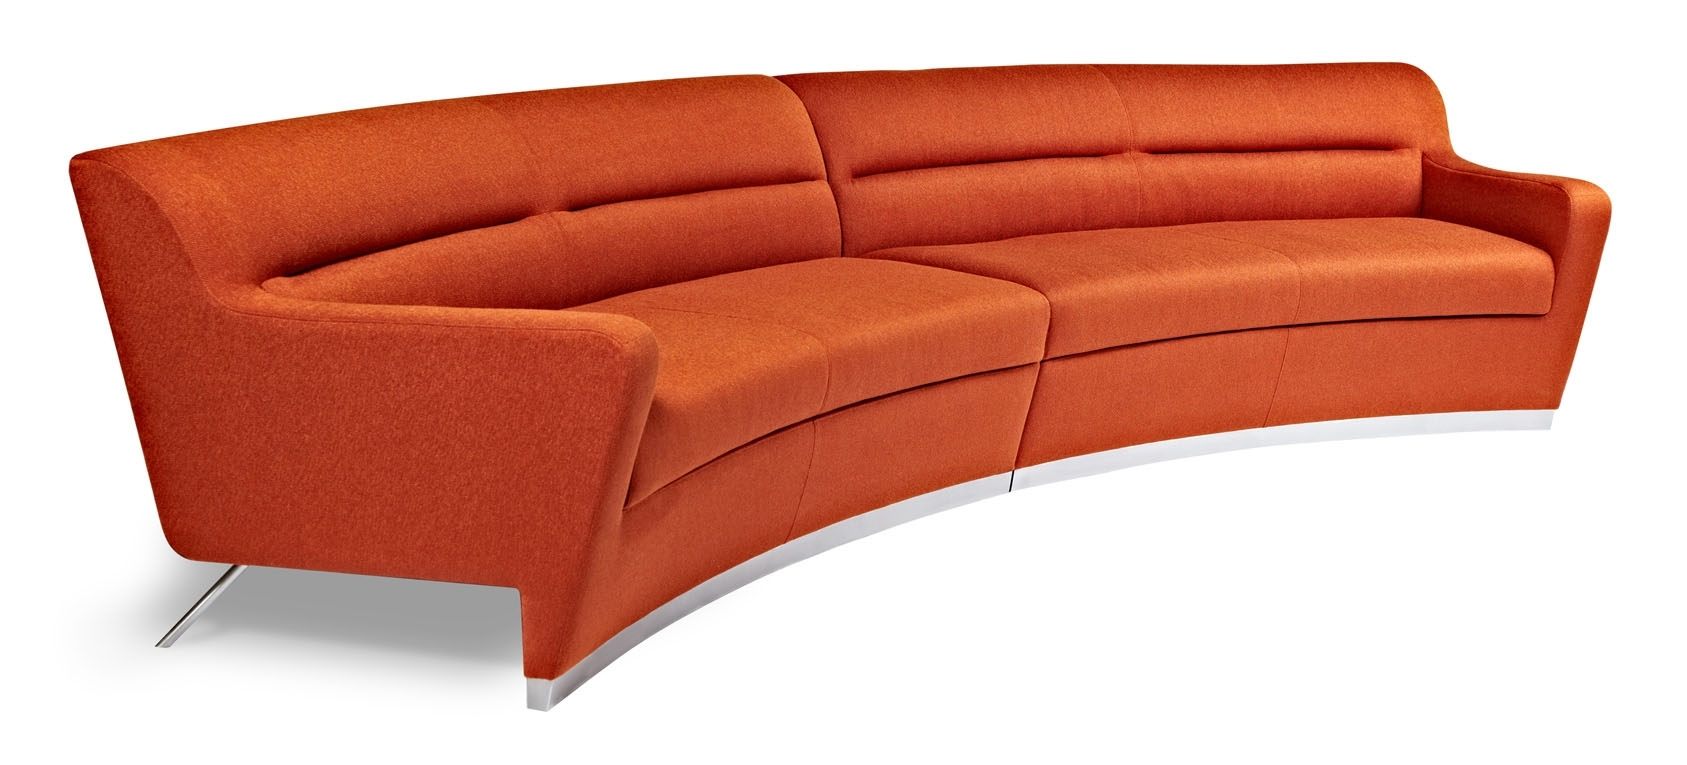 American Leather Niagara Sectional Sofa | Modern Furniture Inside Niagara Sectional Sofas (View 5 of 10)